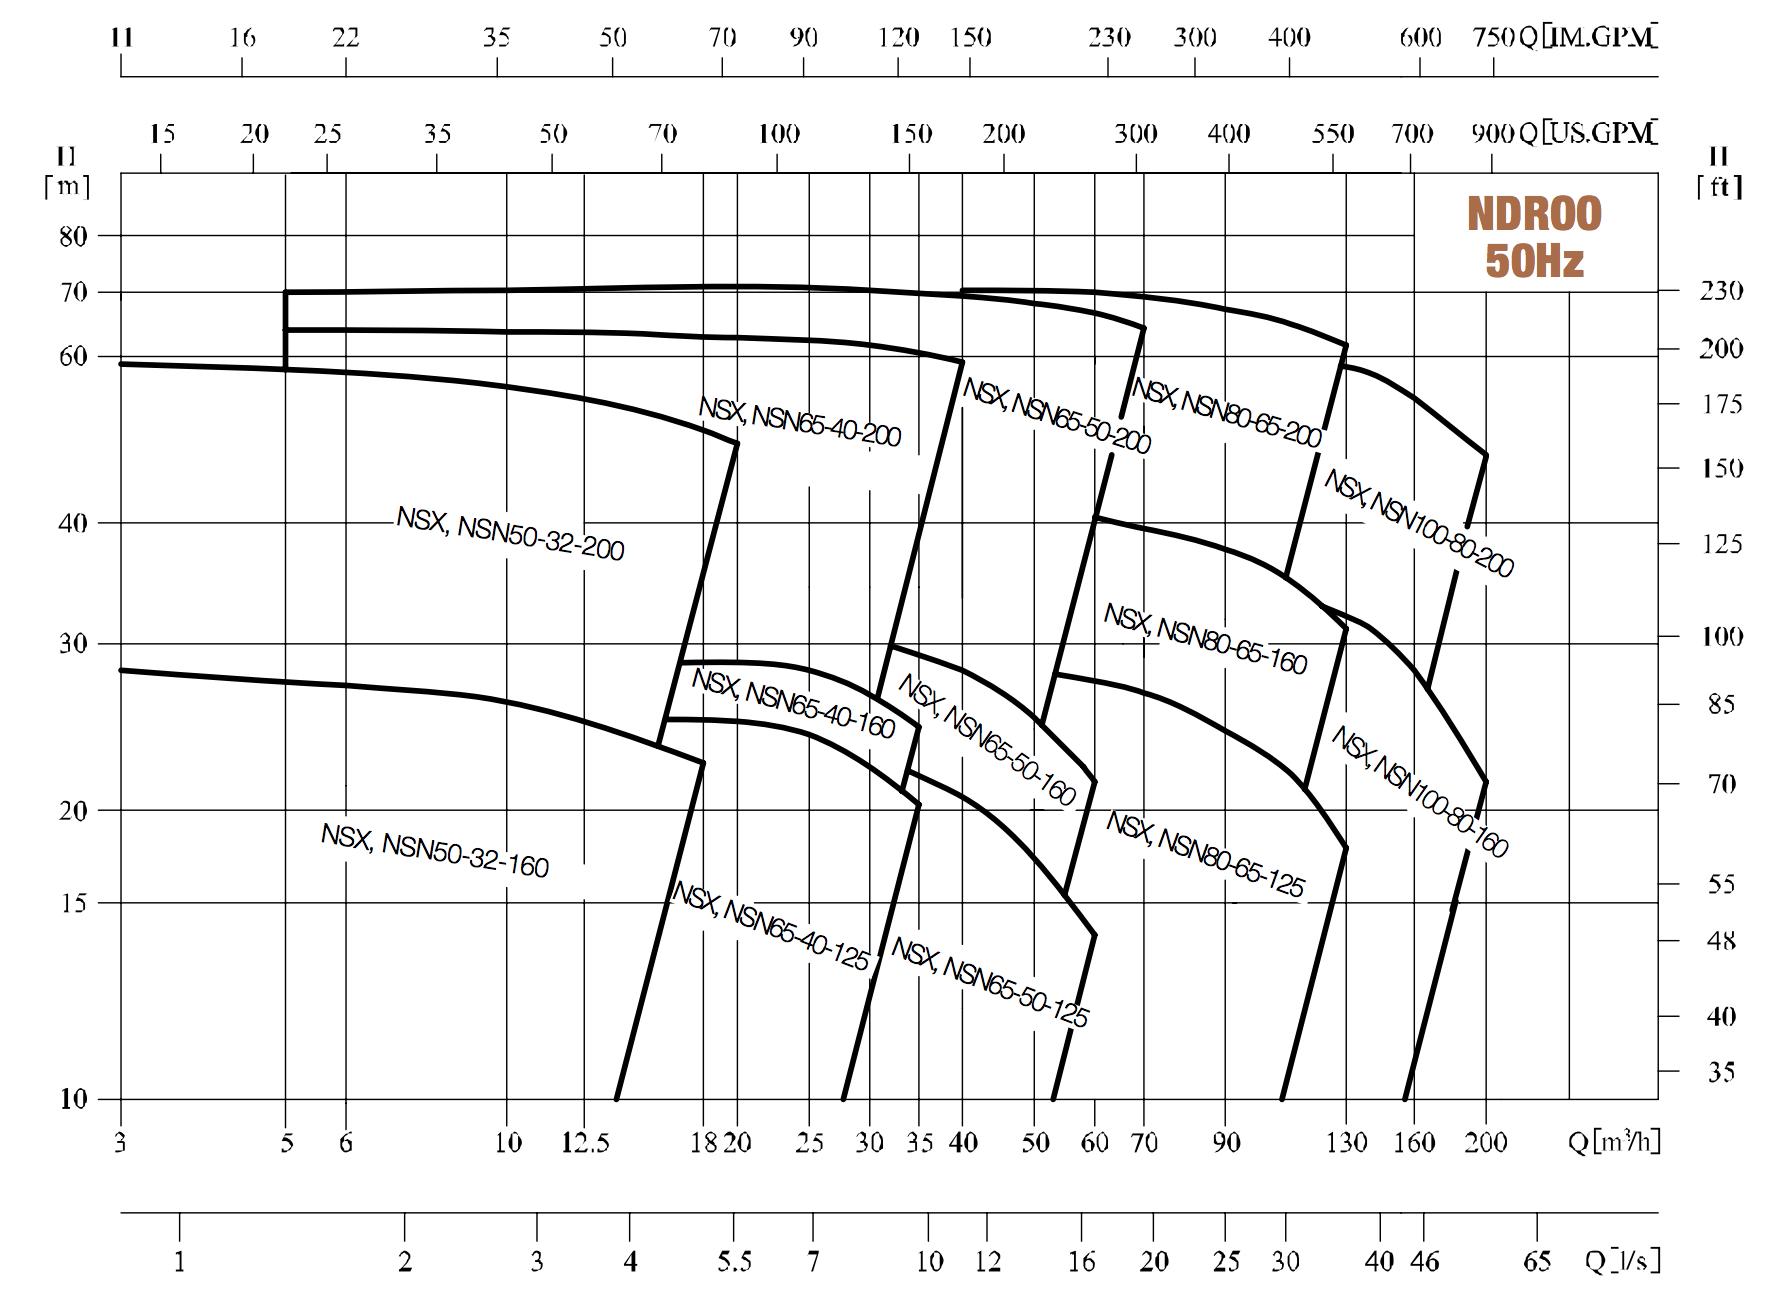 Kennfelder: NDROO Blockpumpe / Normpumpe von hydroo